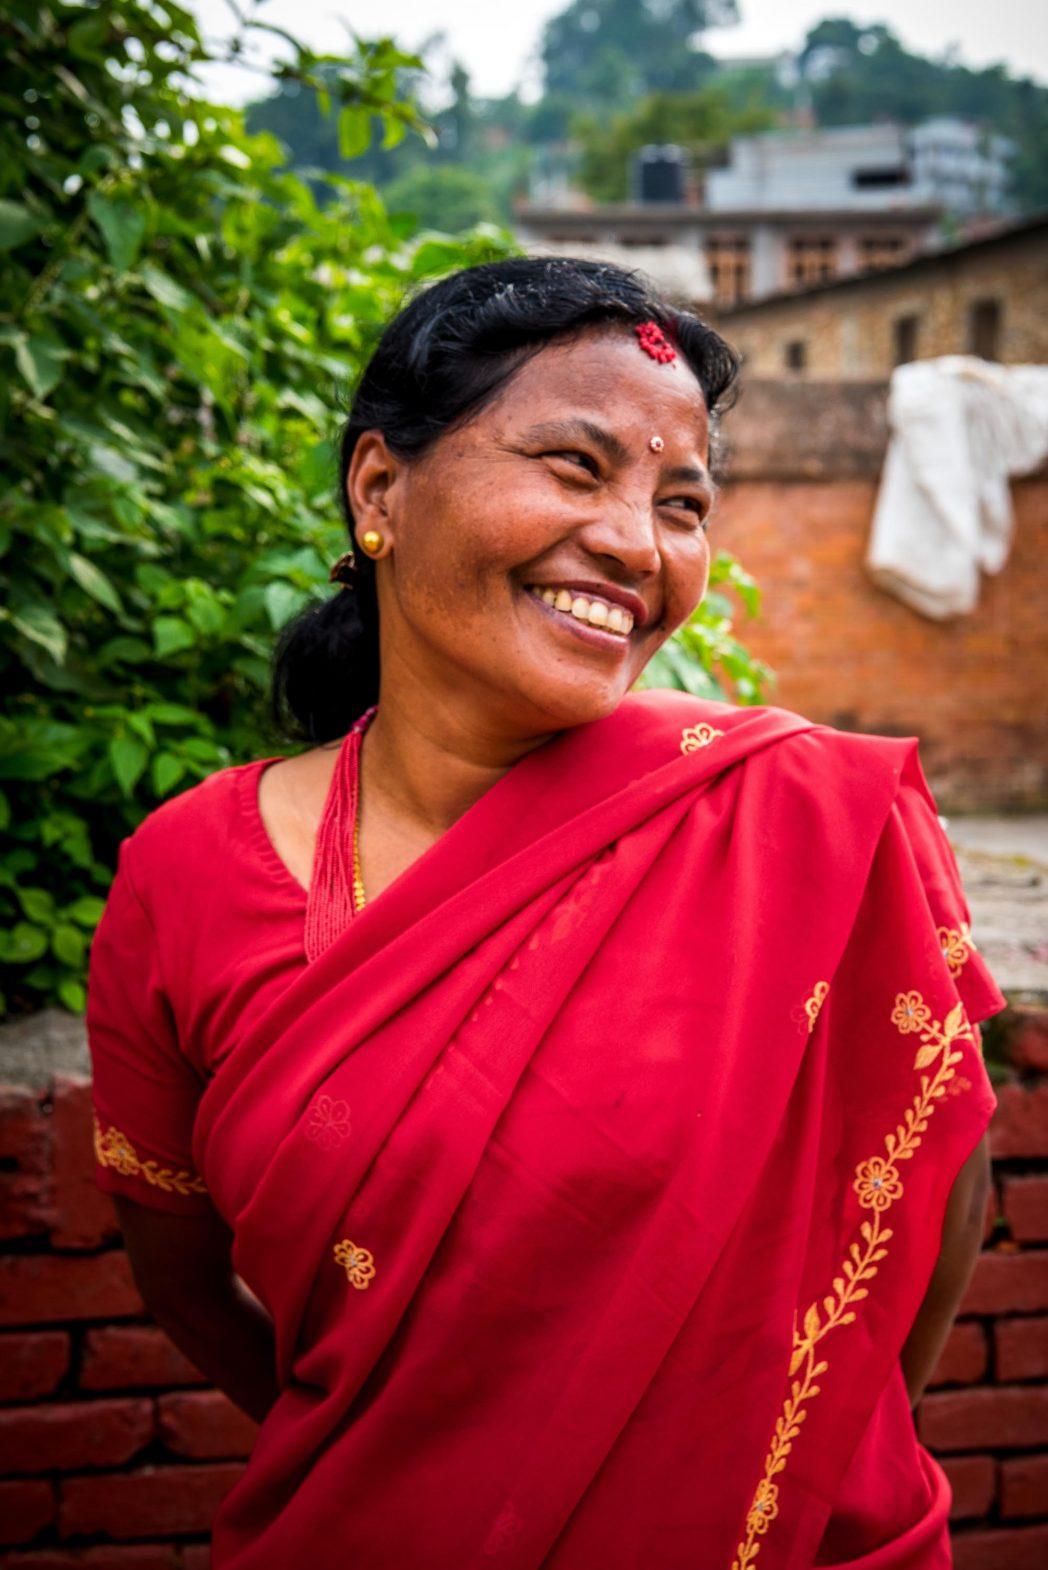 A local woman in Panauti, Nepal.